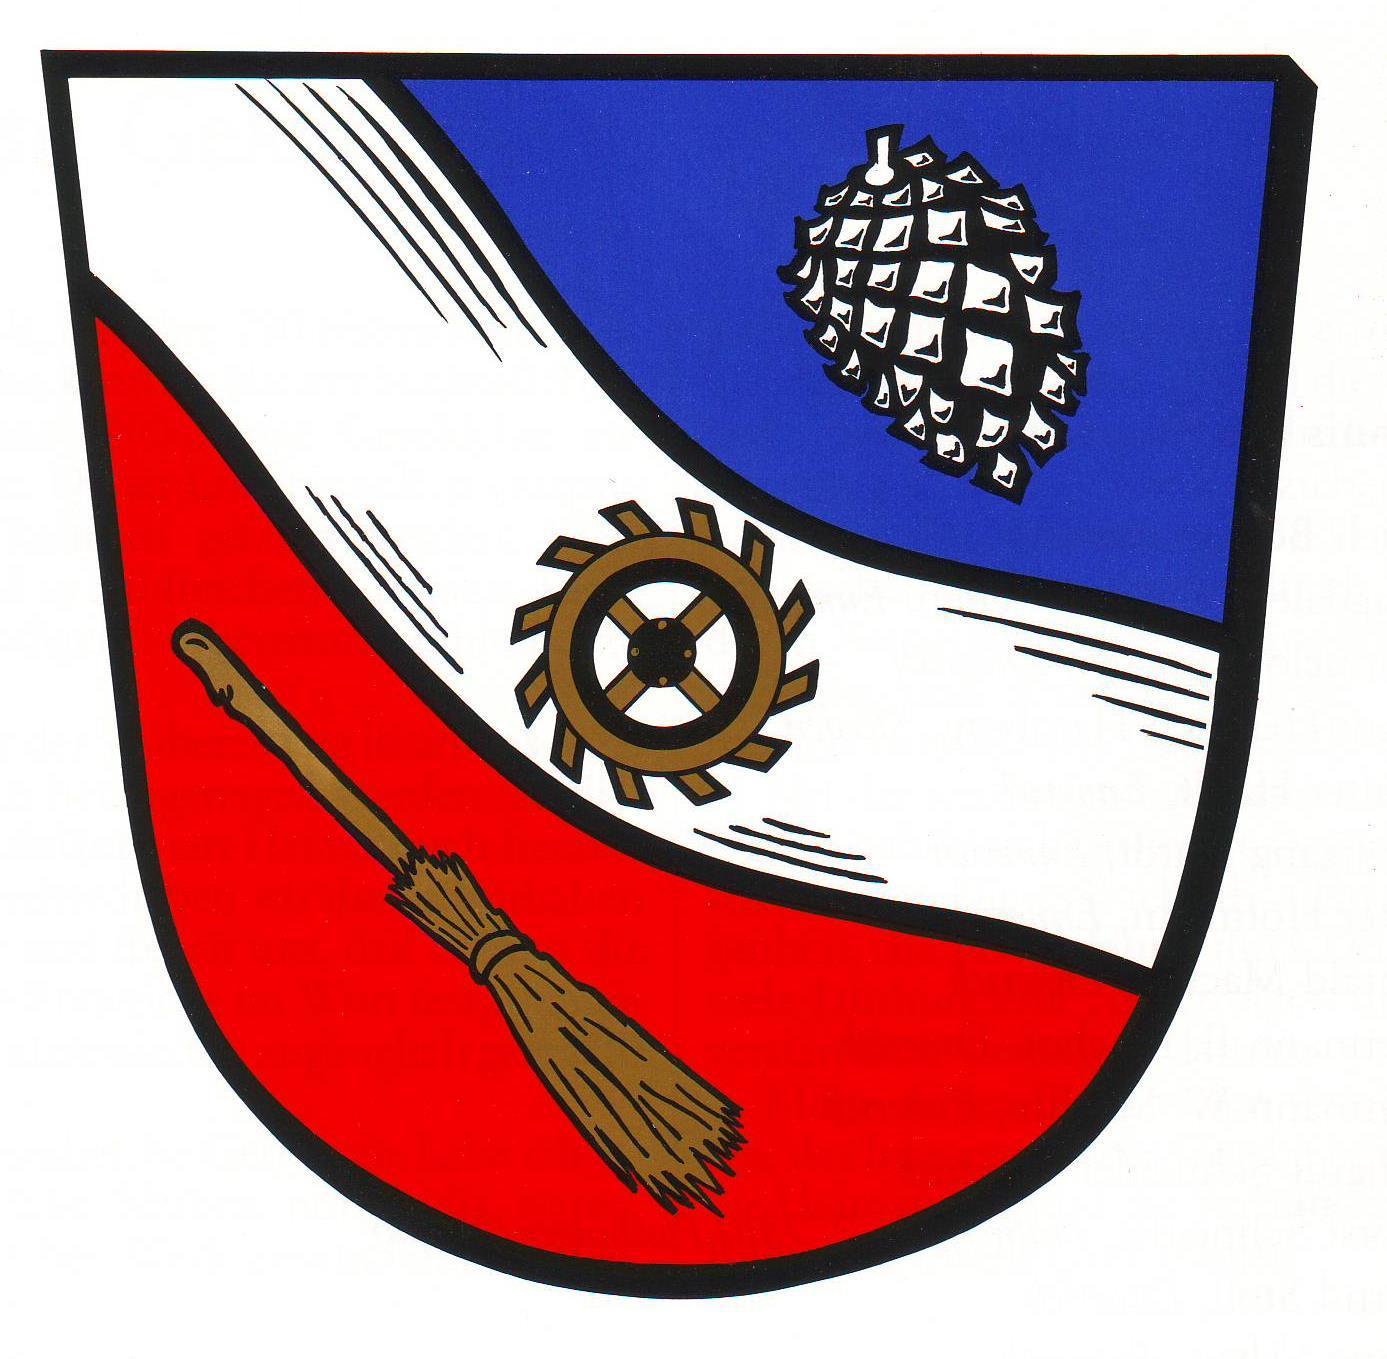 (c) Huv-ennerich.de